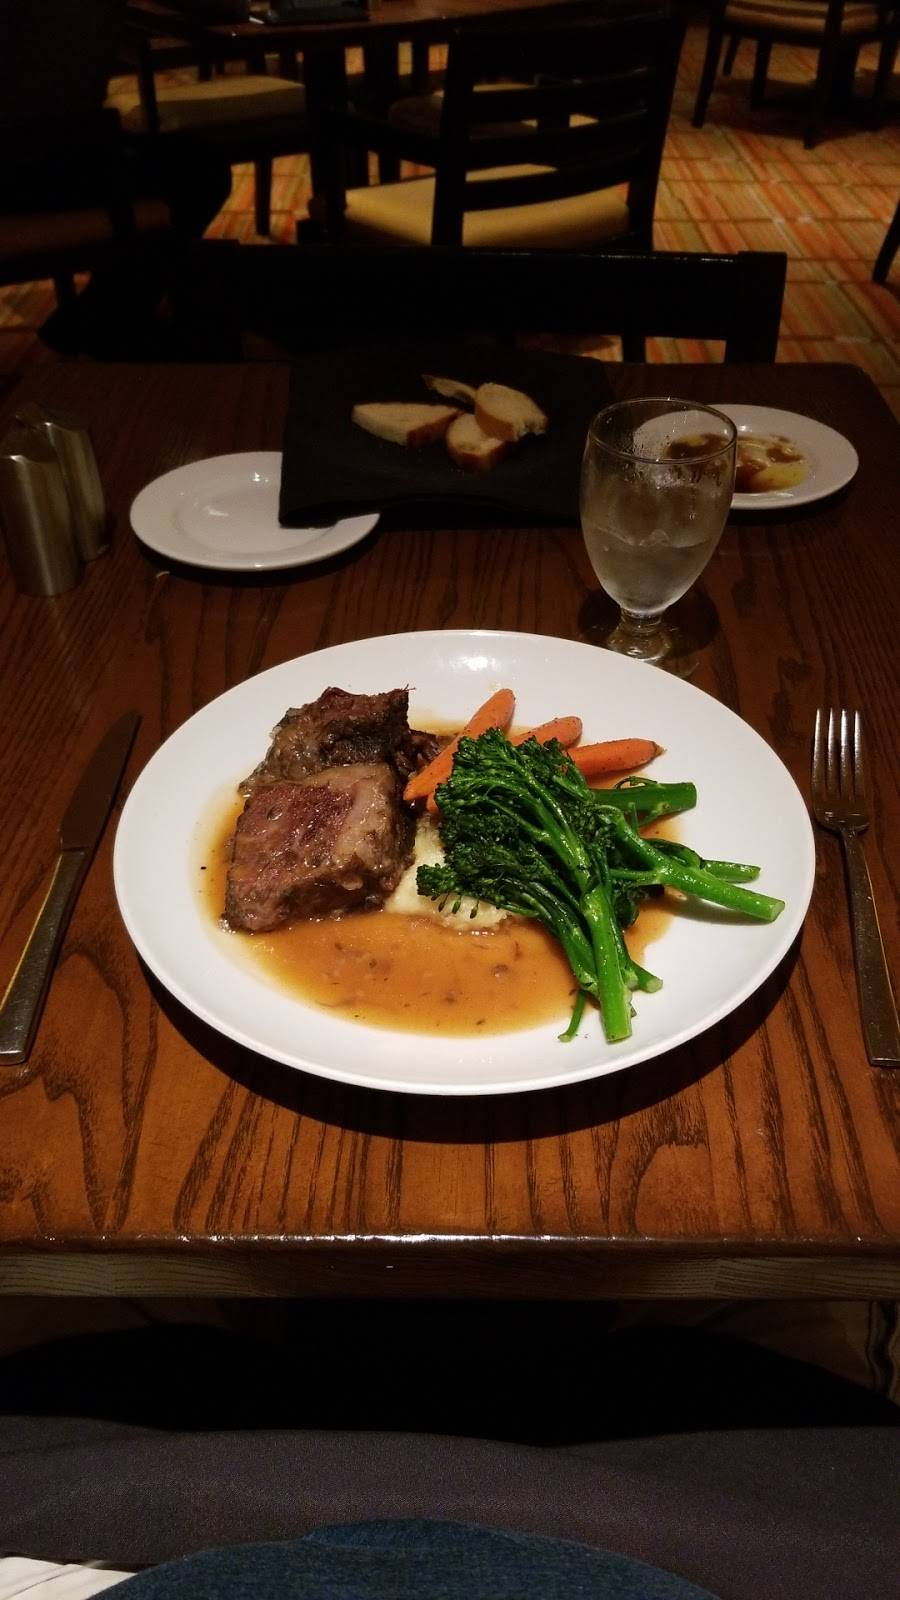 37 North | restaurant | 835 Airport Blvd, Burlingame, CA 94010, USA | 6503732237 OR +1 650-373-2237